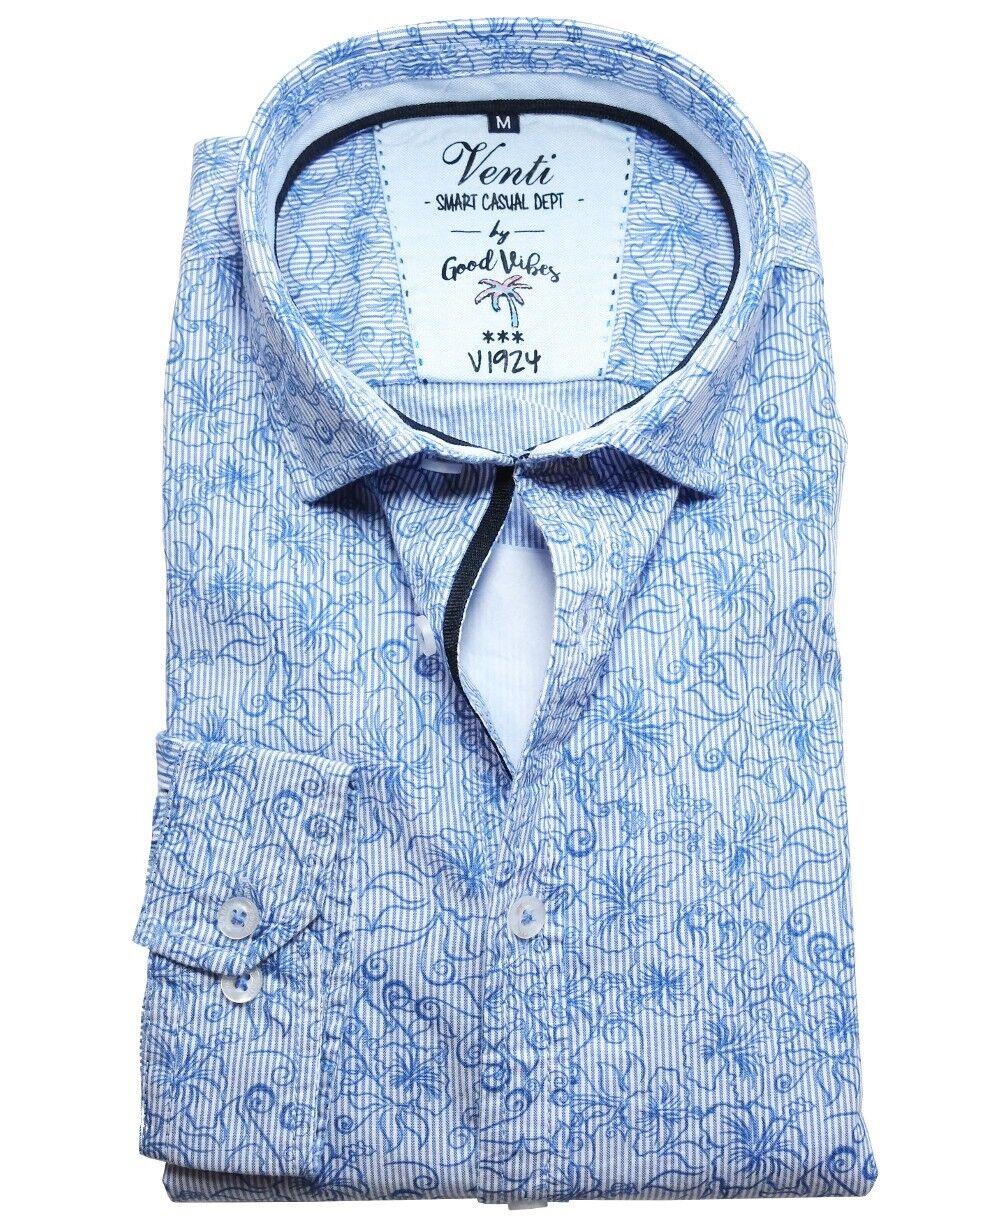 Venti Slim Fit Smart Casual Langarmhemd in white hellblue Streifen Floraldessin